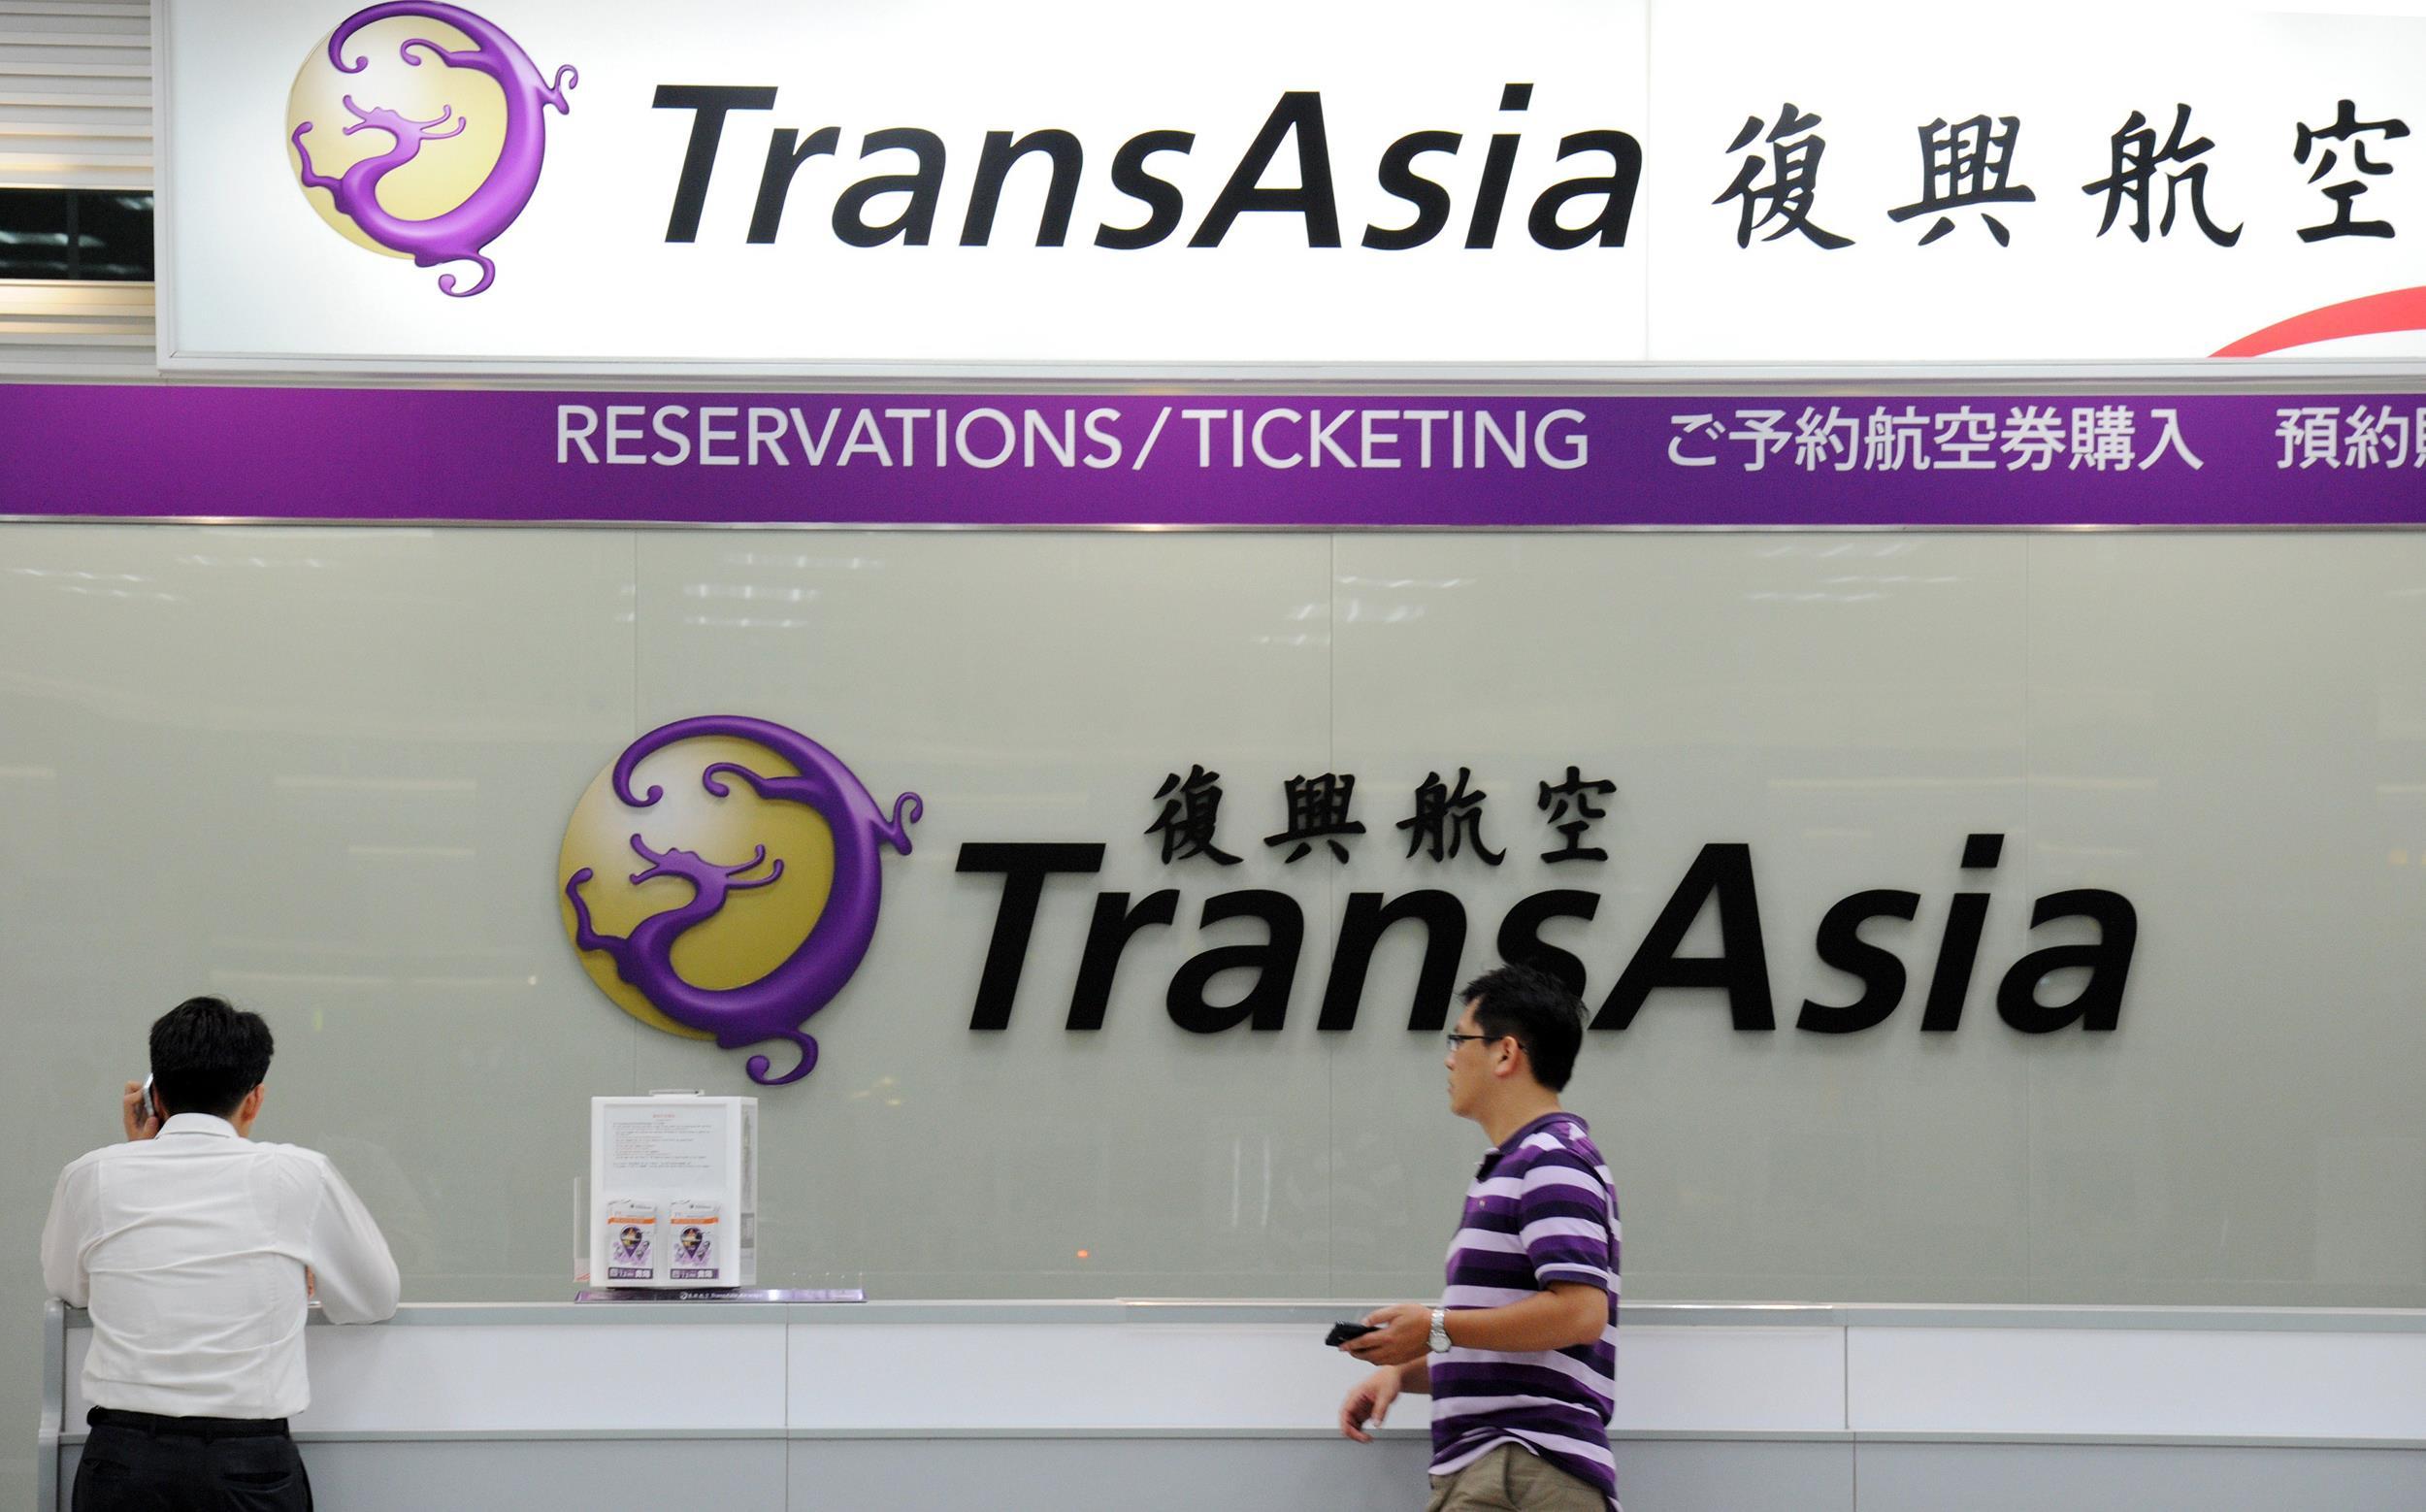 Image: TransAsia reservations desk